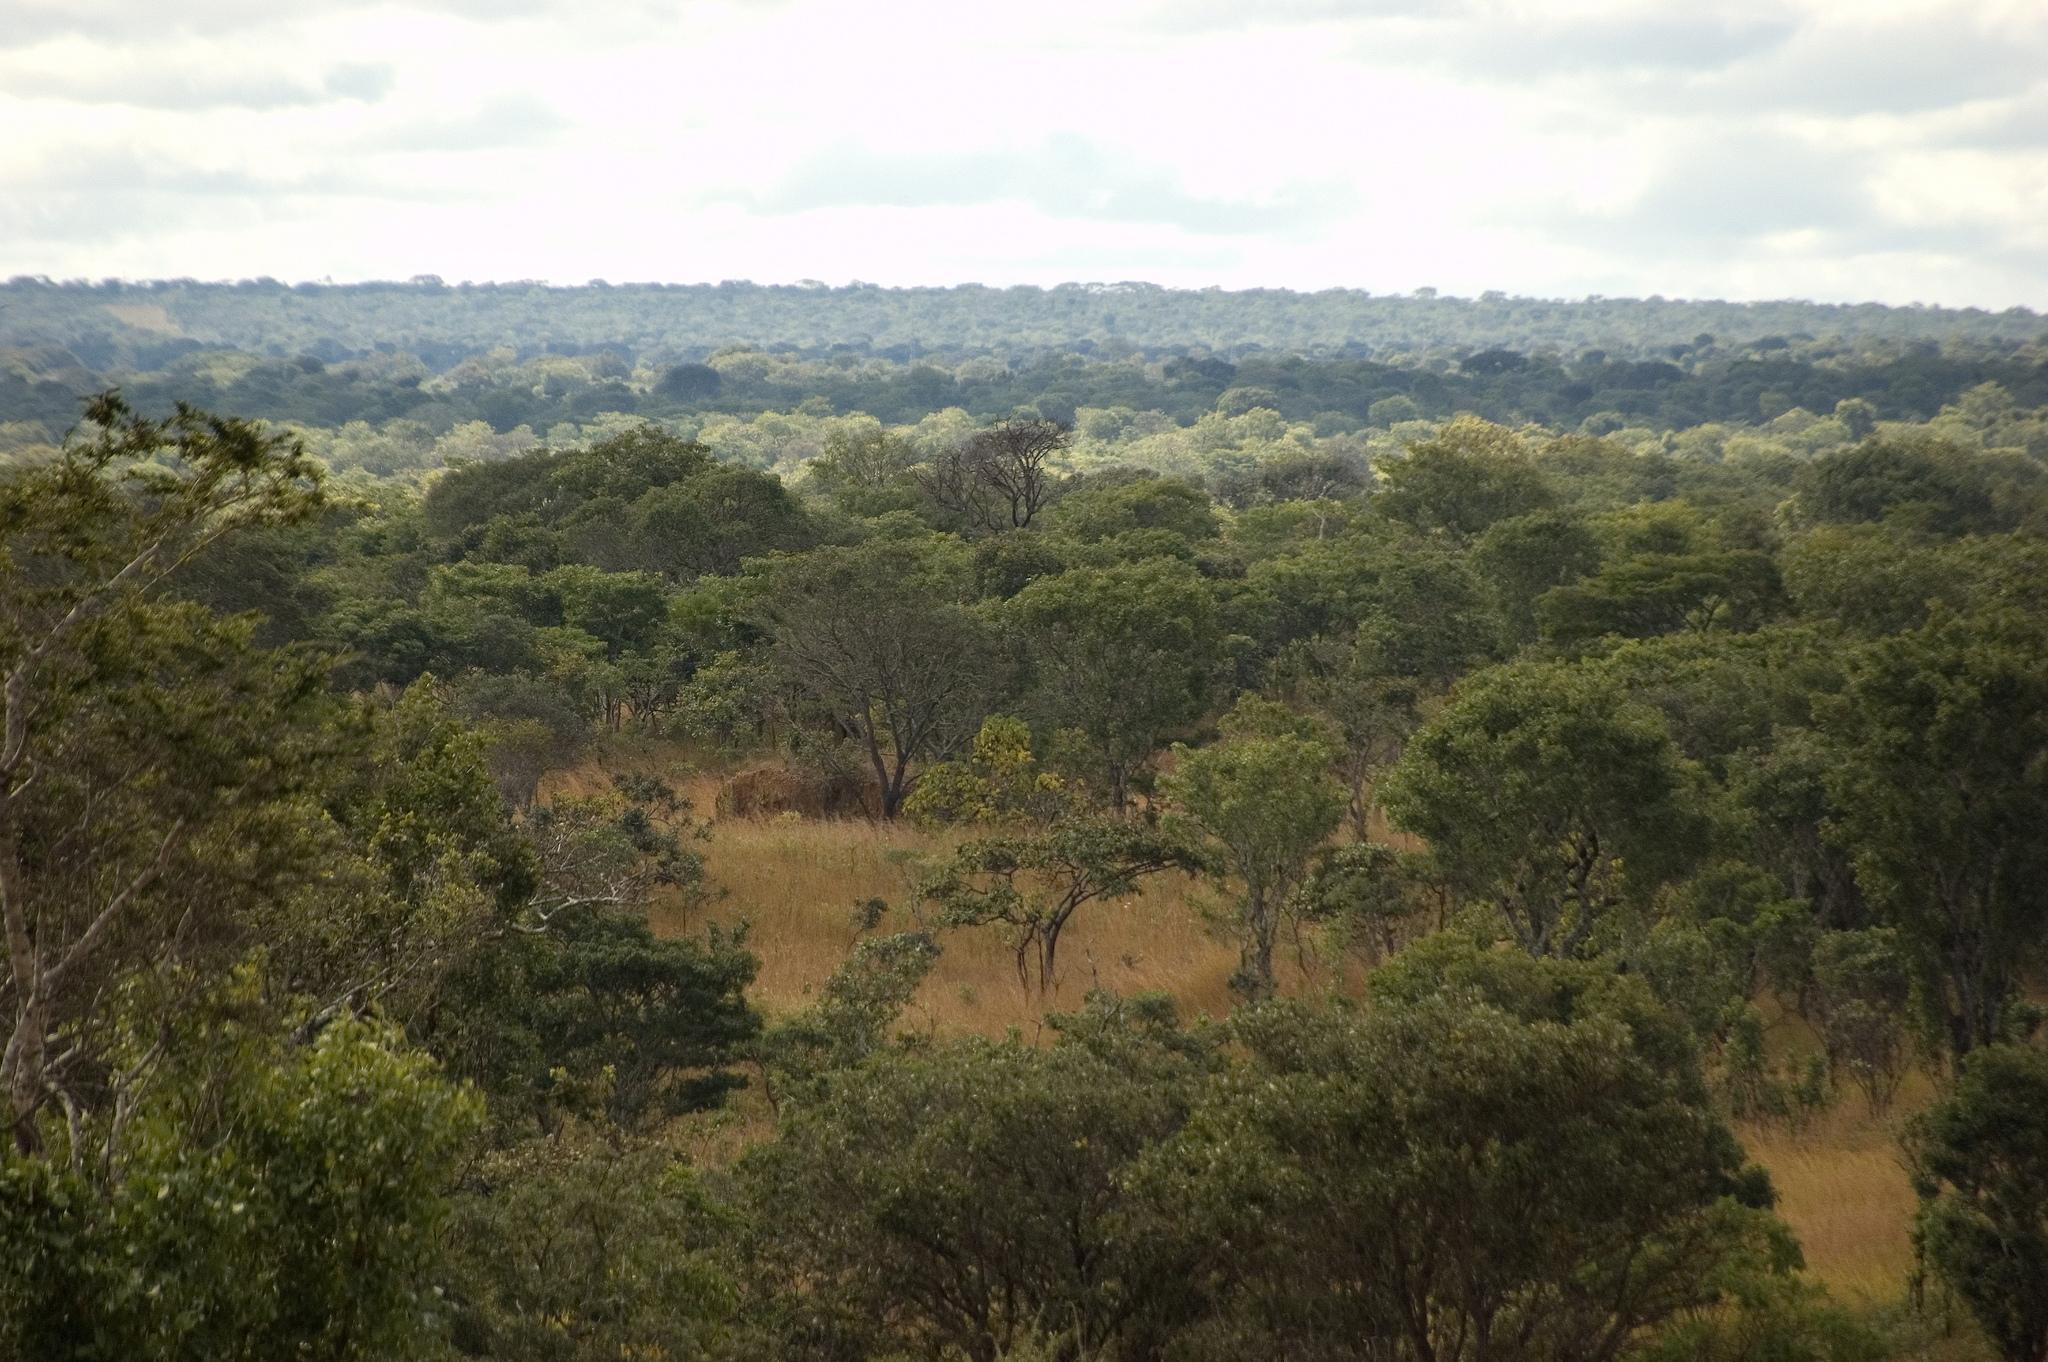 A Ponzi scheme with Nature?